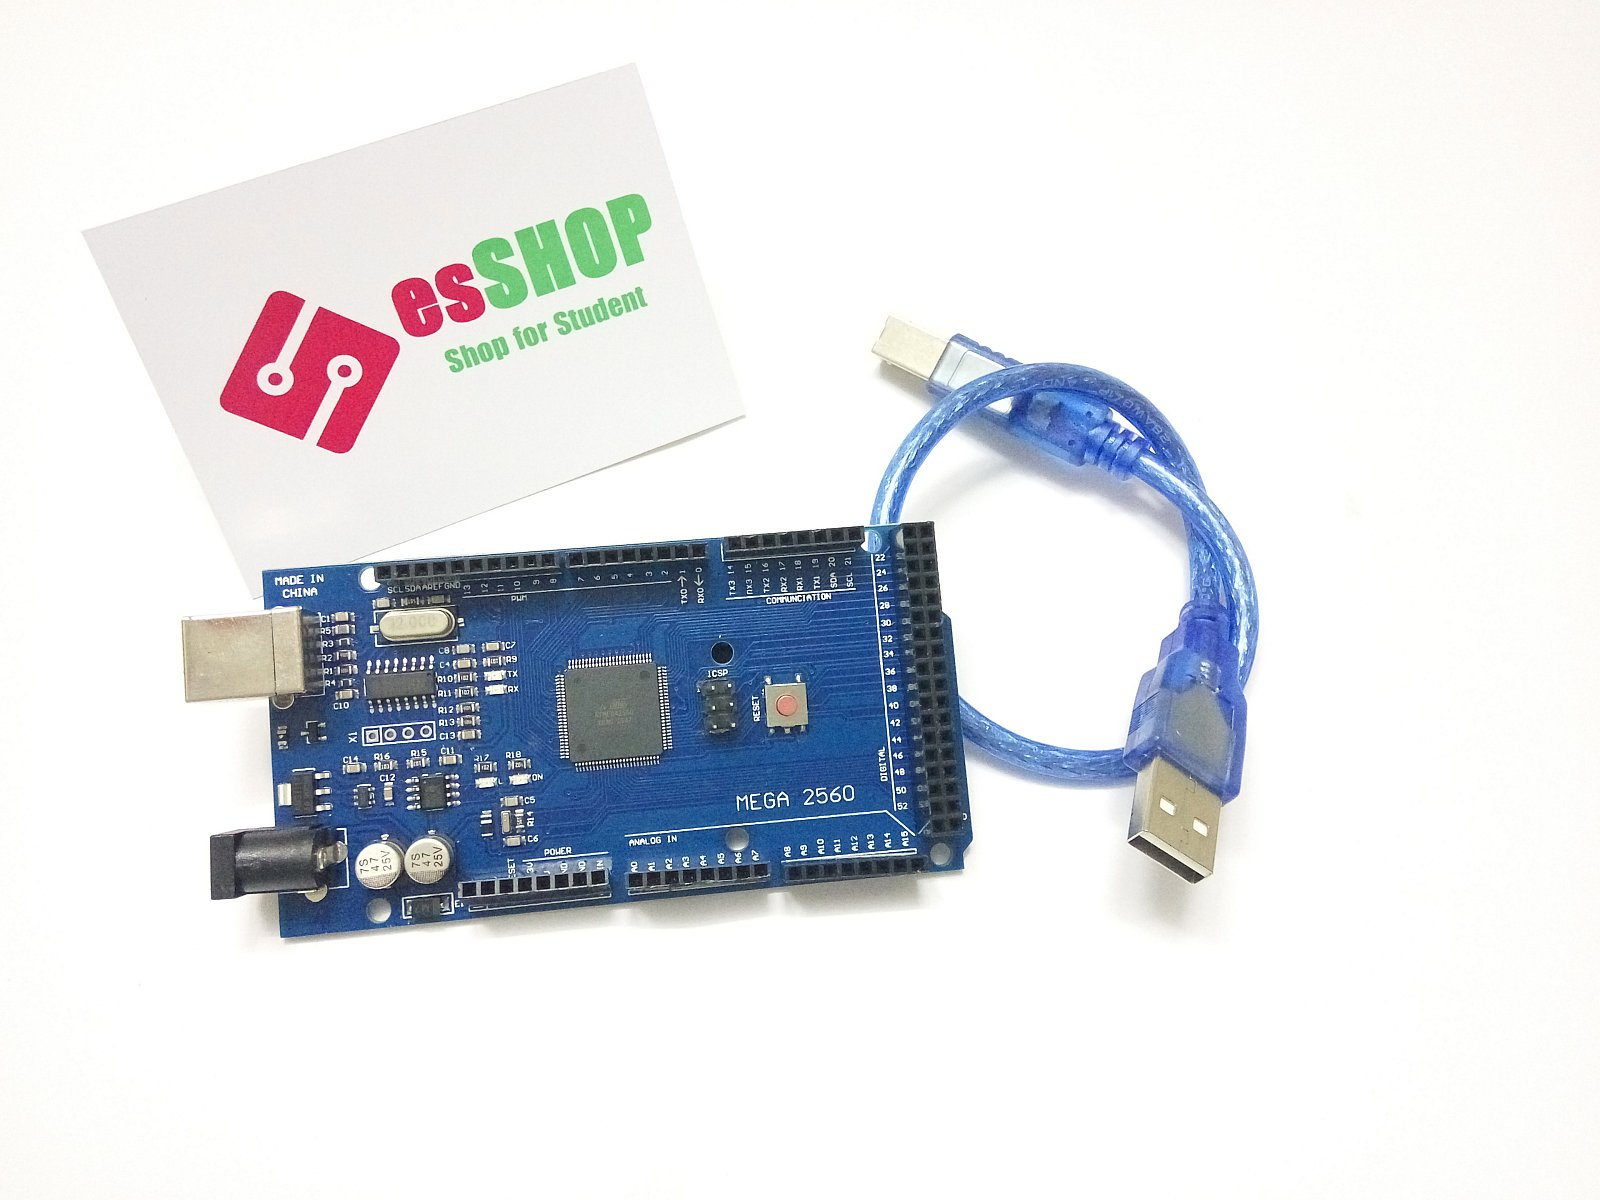 B0184 - Board Arduino Mega 2560 + Cáp USB